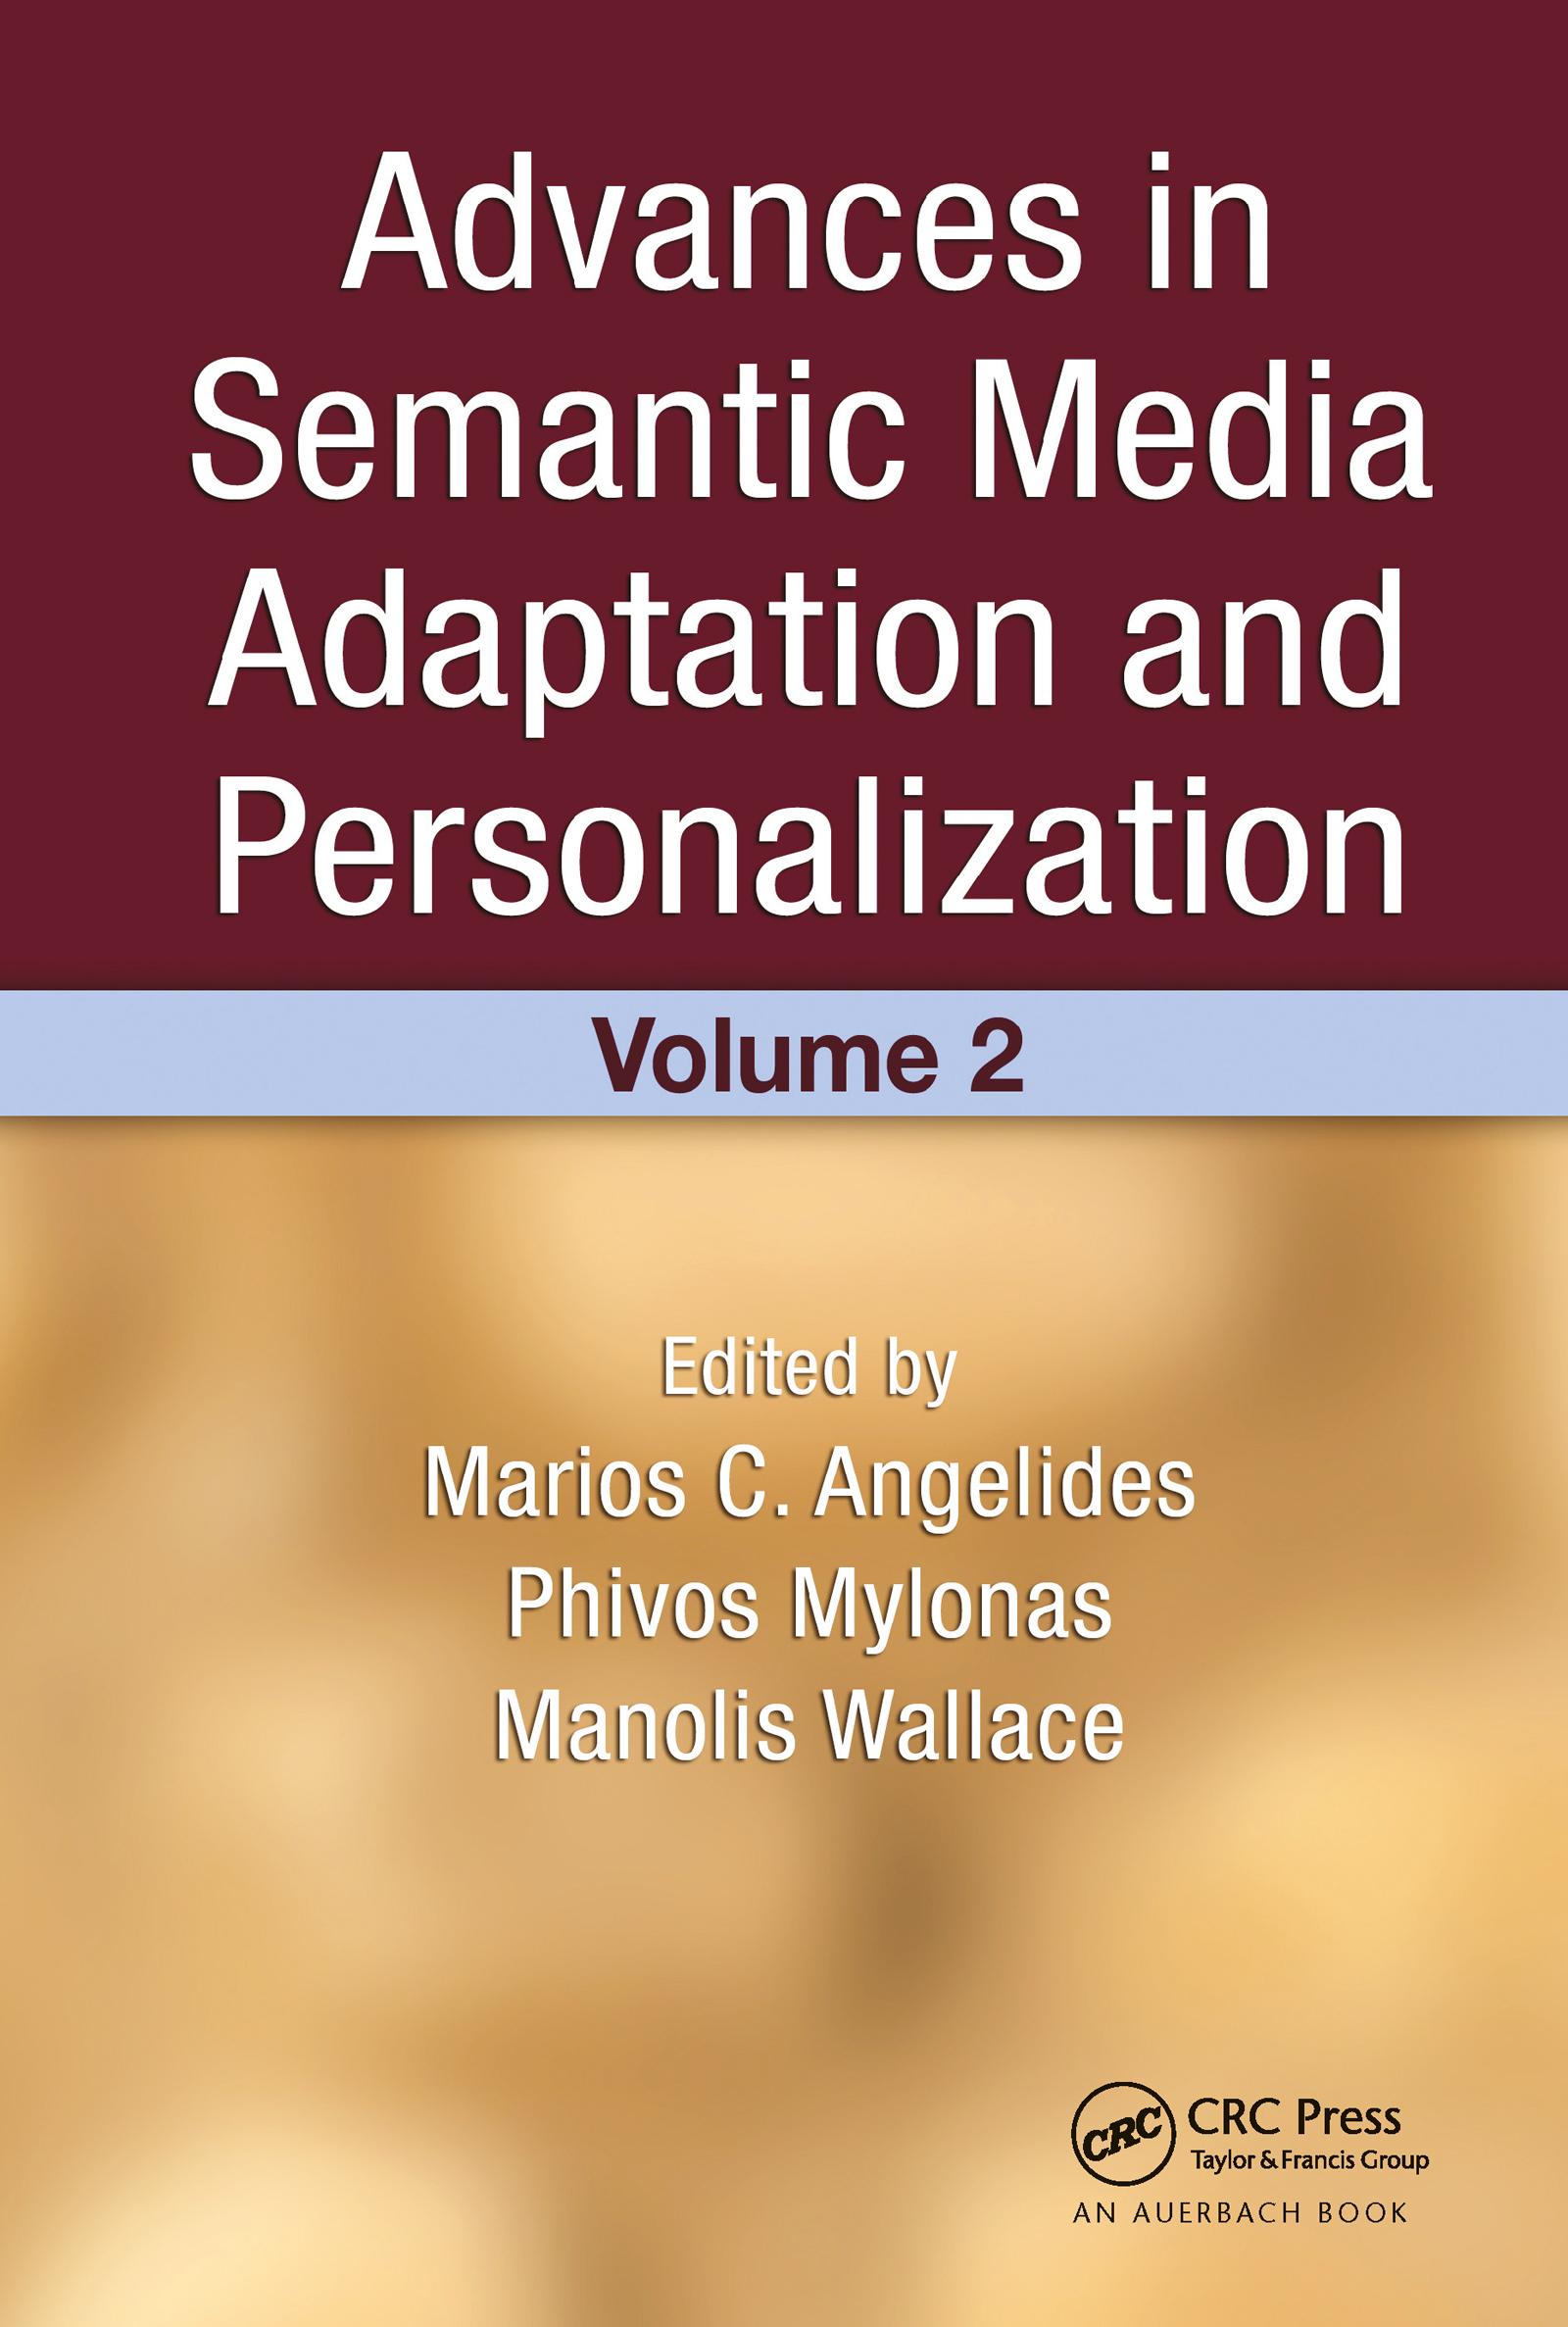 Advances in Semantic Media Adaptation and Personalization, Volume 2: 2nd Edition (Hardback) book cover